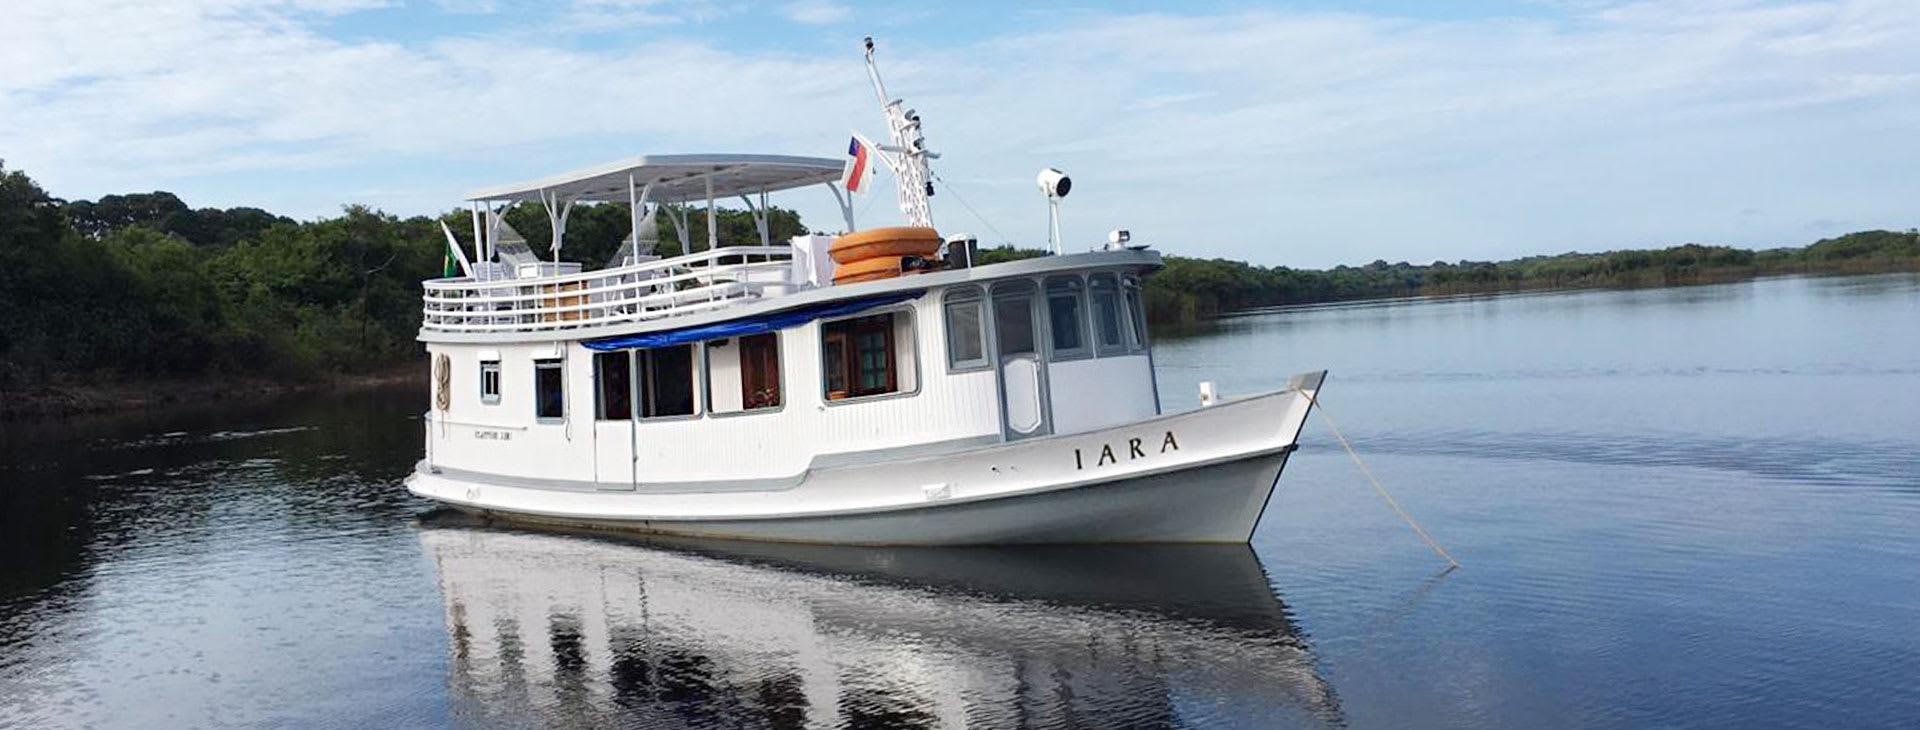 Iara anchored